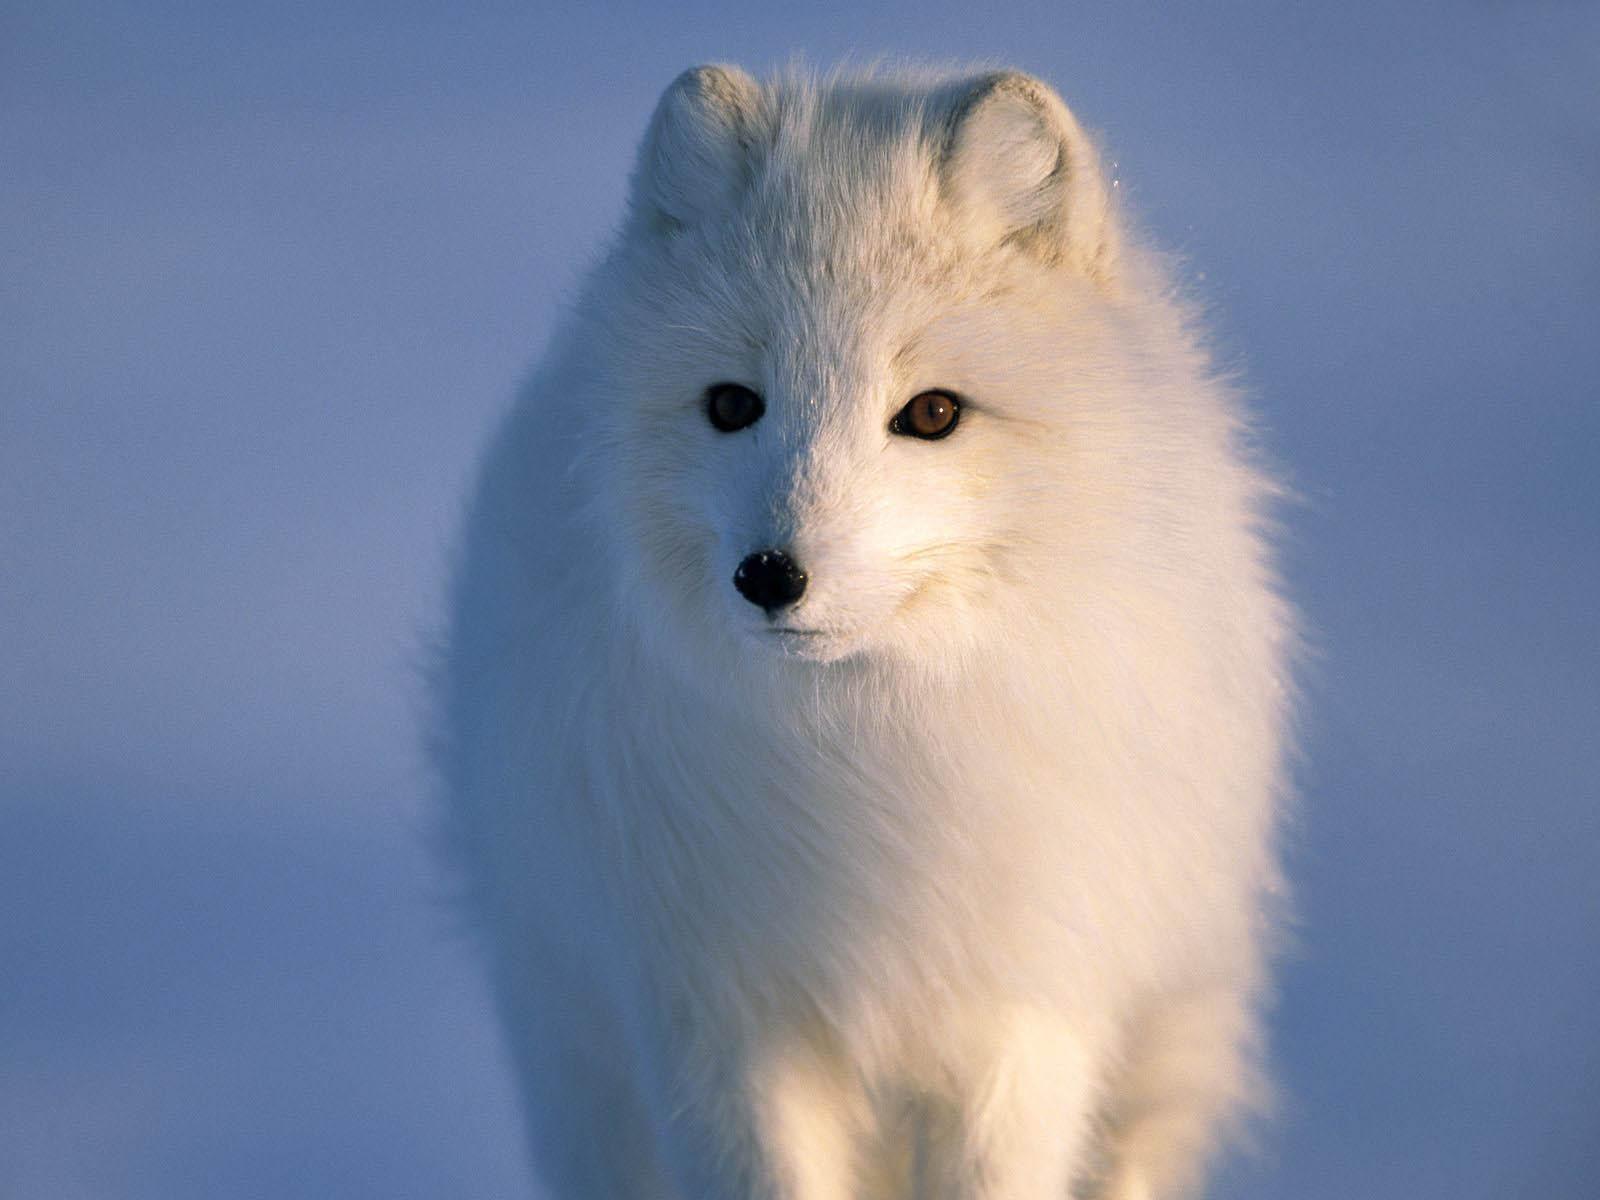 Картинка Белая собака картинка - Картинки Разные ...